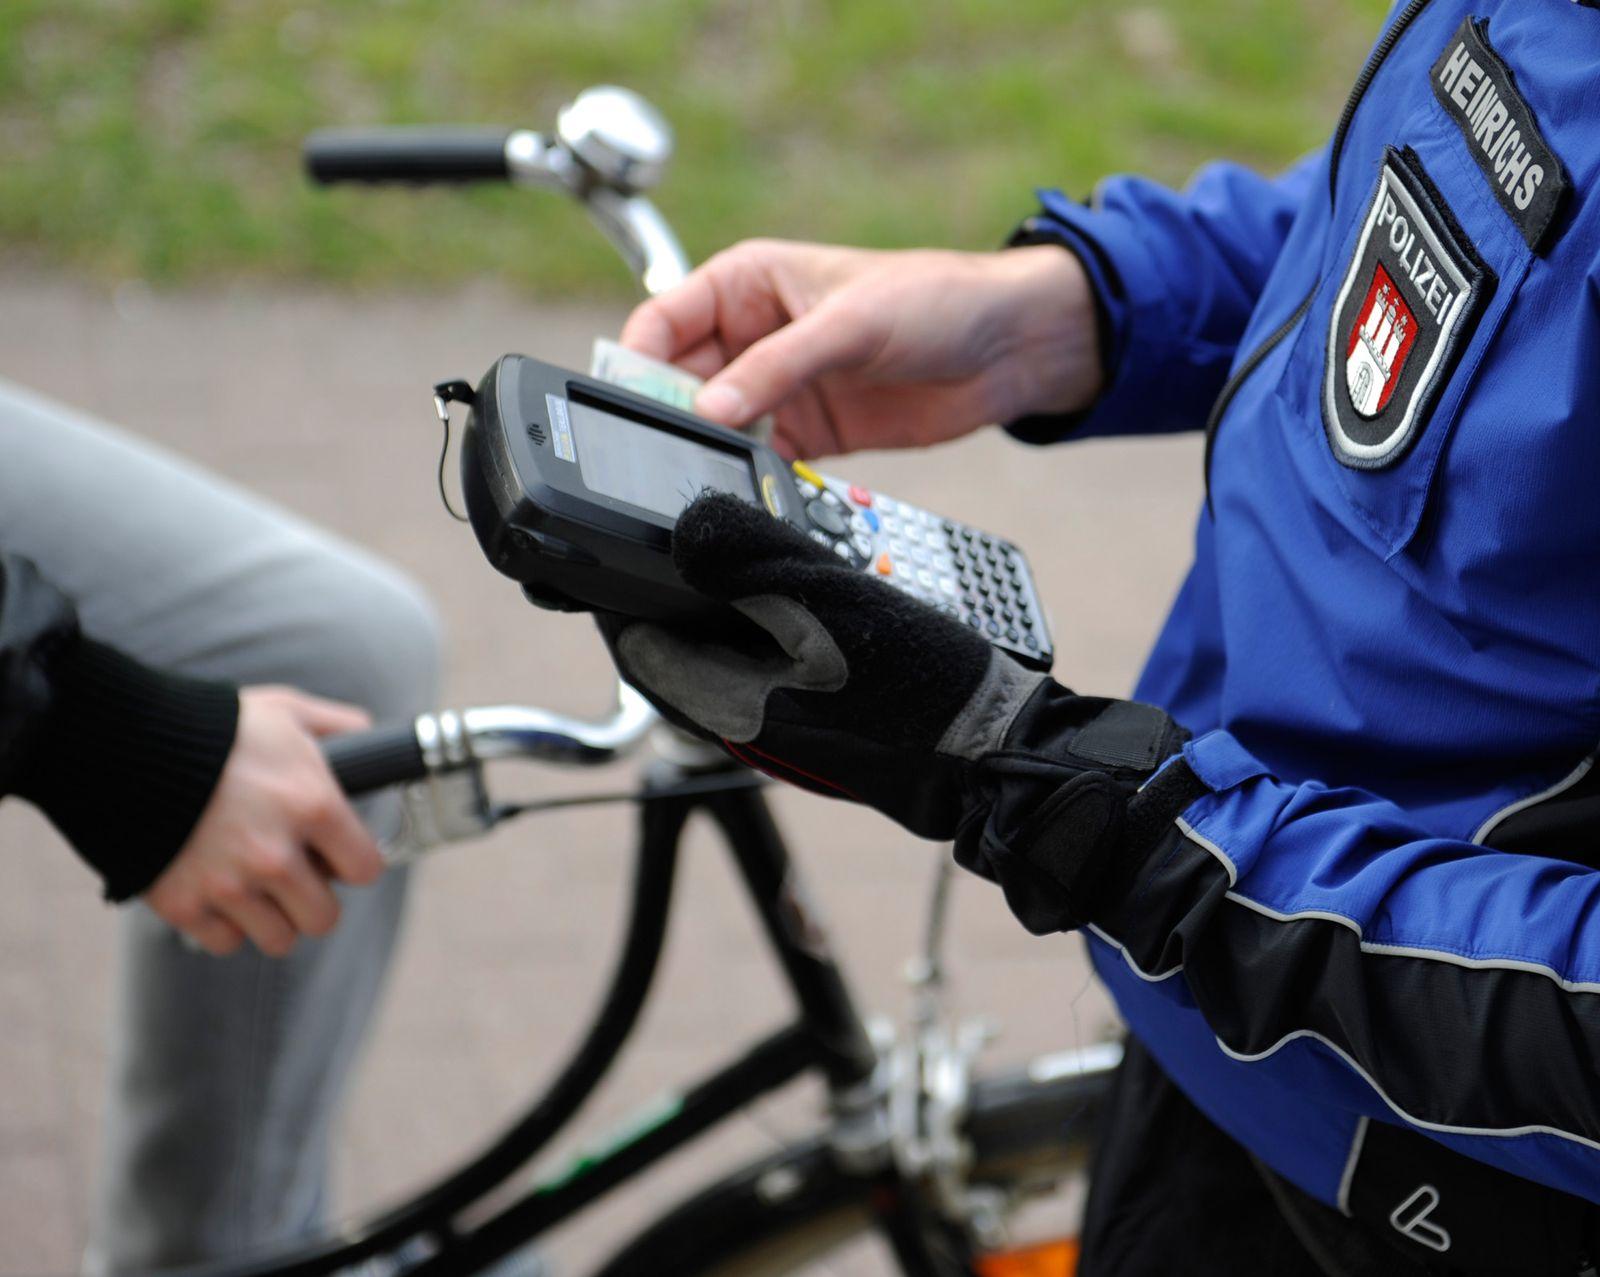 Polizei / Fahrrad